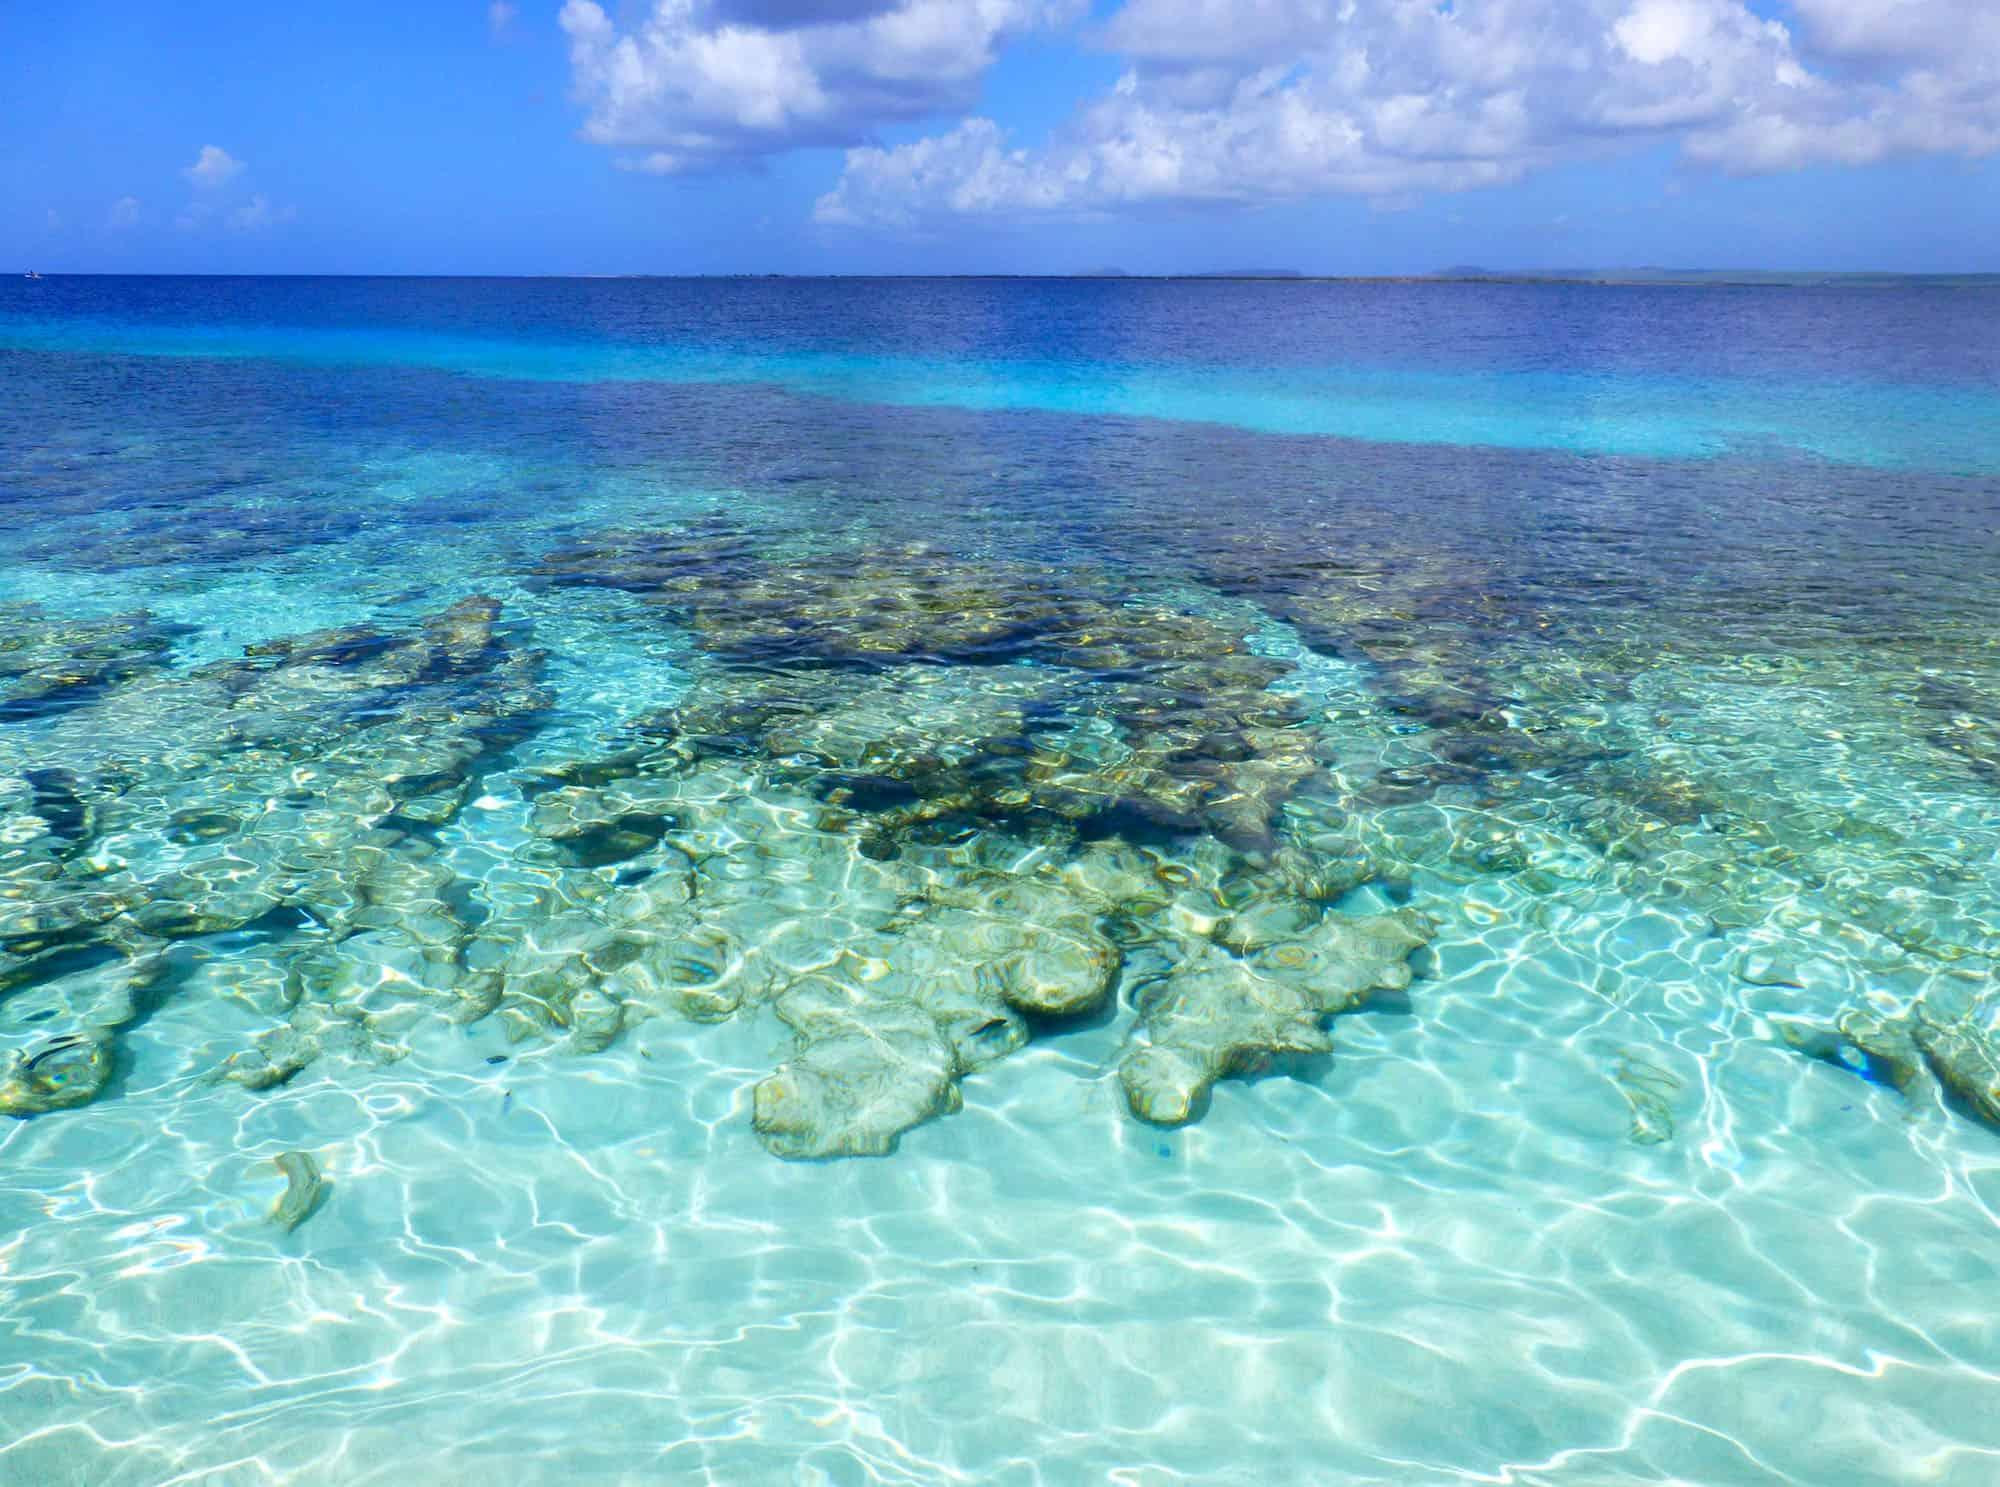 Te Amo Beach, Bonaire, best beaches of Bonaire, Leeward Antilles, best beaches of the Leeward Antilles, Lesser Antilles Vacations, Best beaches of the Lesser Antilles, best beaches in the Caribbean